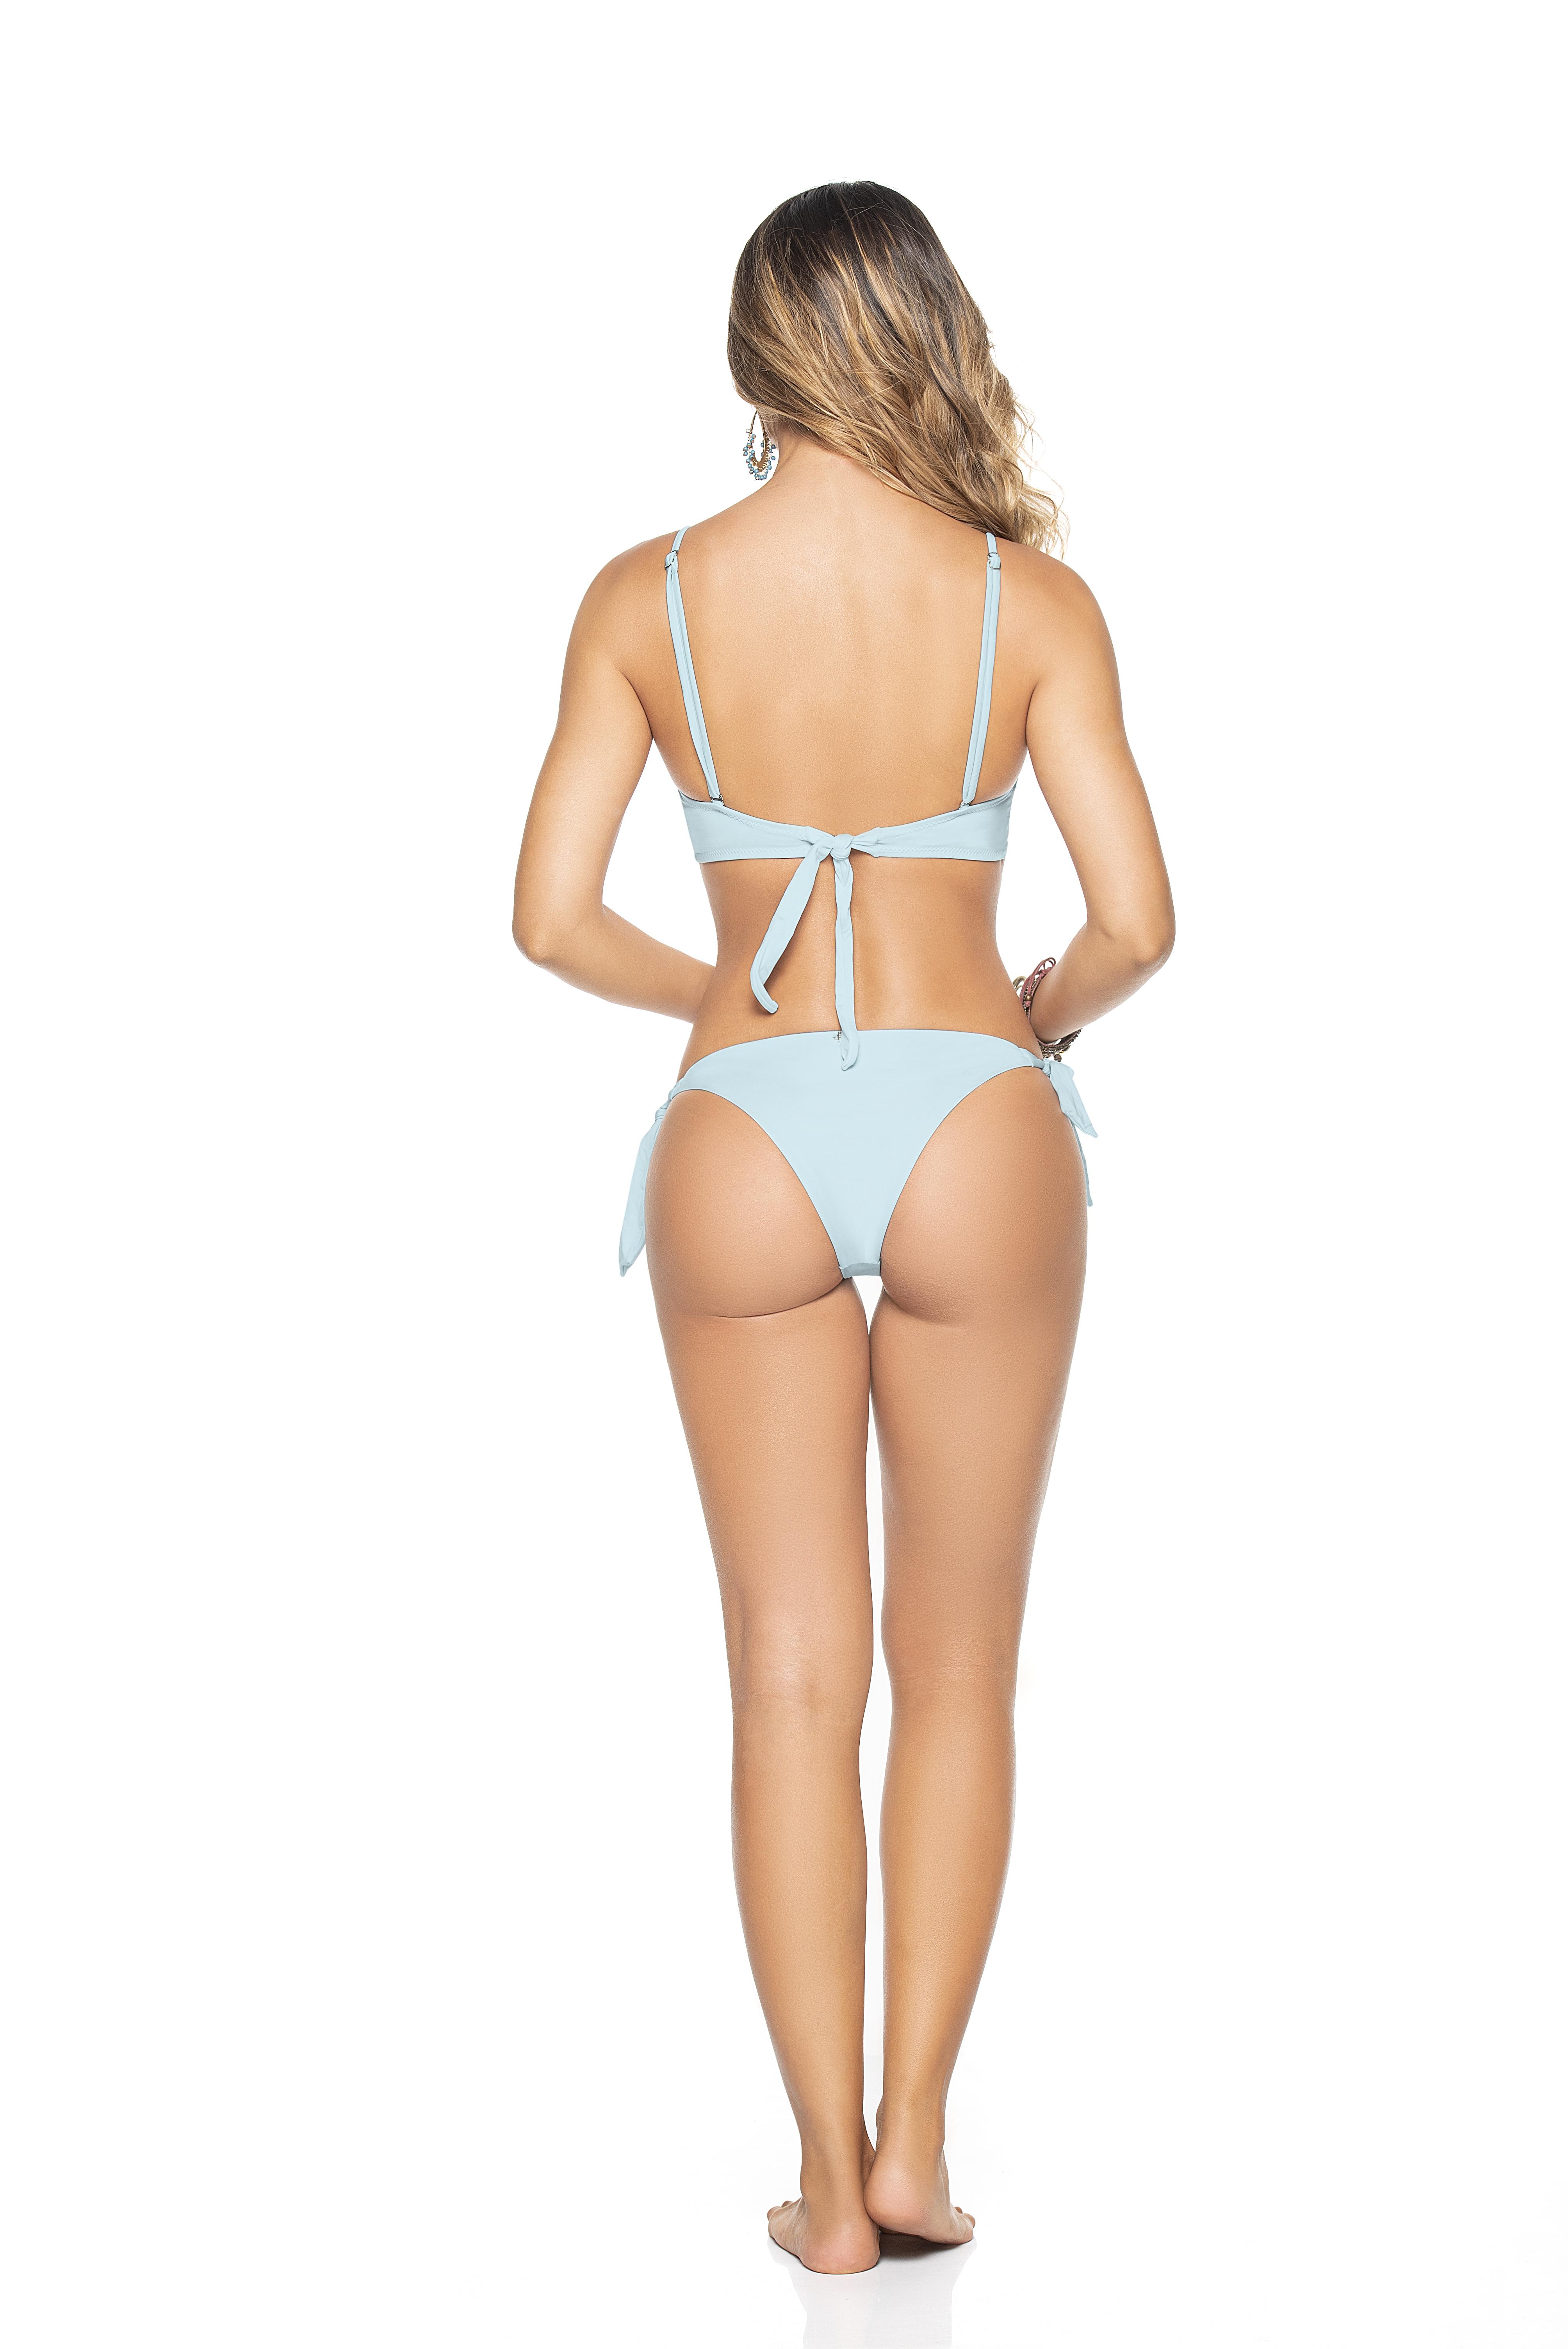 Phax Licht Blauwe Triangel Tie Side Bikini Macaron